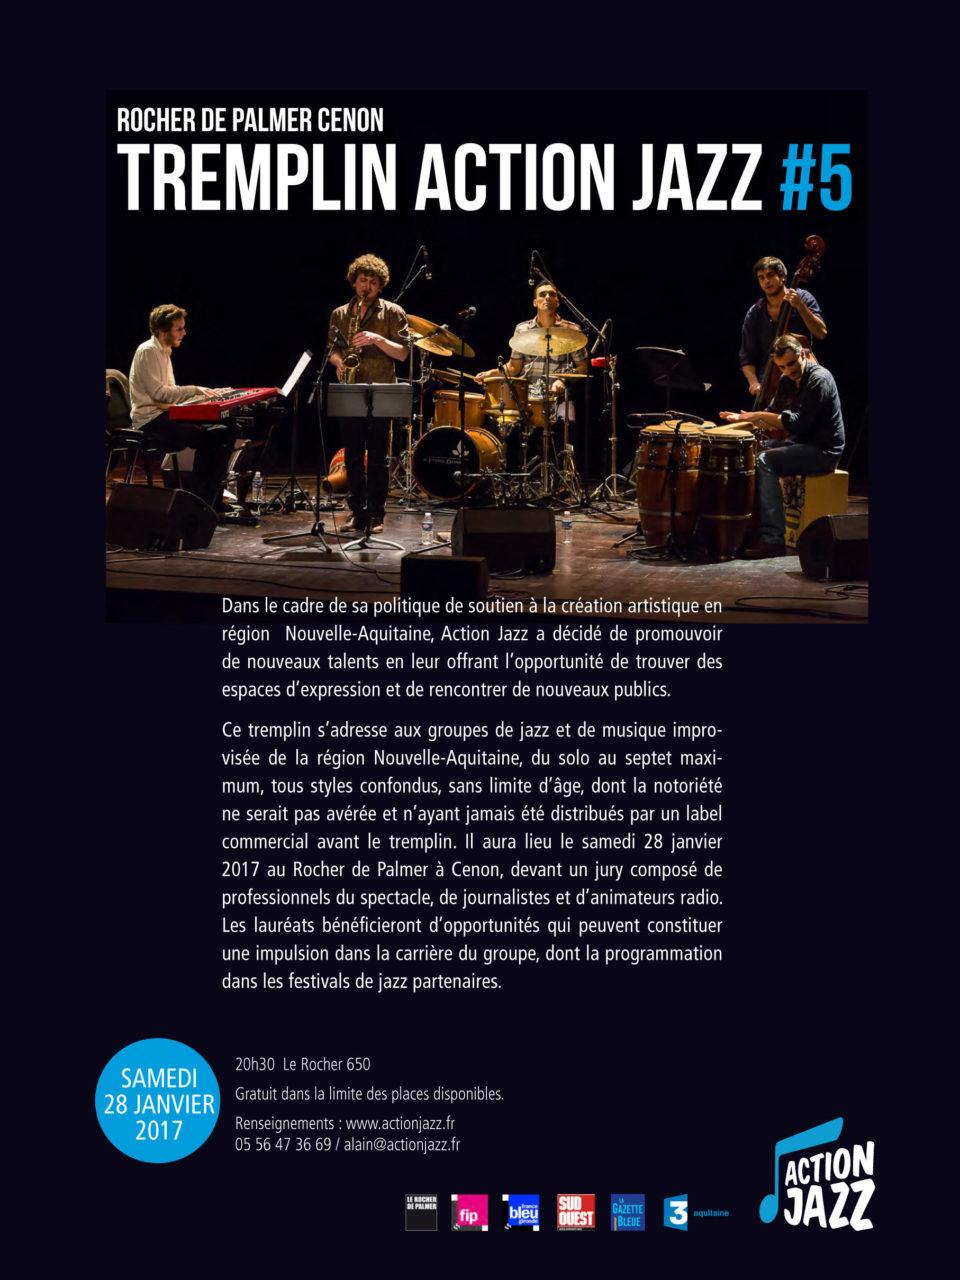 Tremplin Action Jazz 2017, samedi 28/01/2017 20h30, au Rocher de Palmer